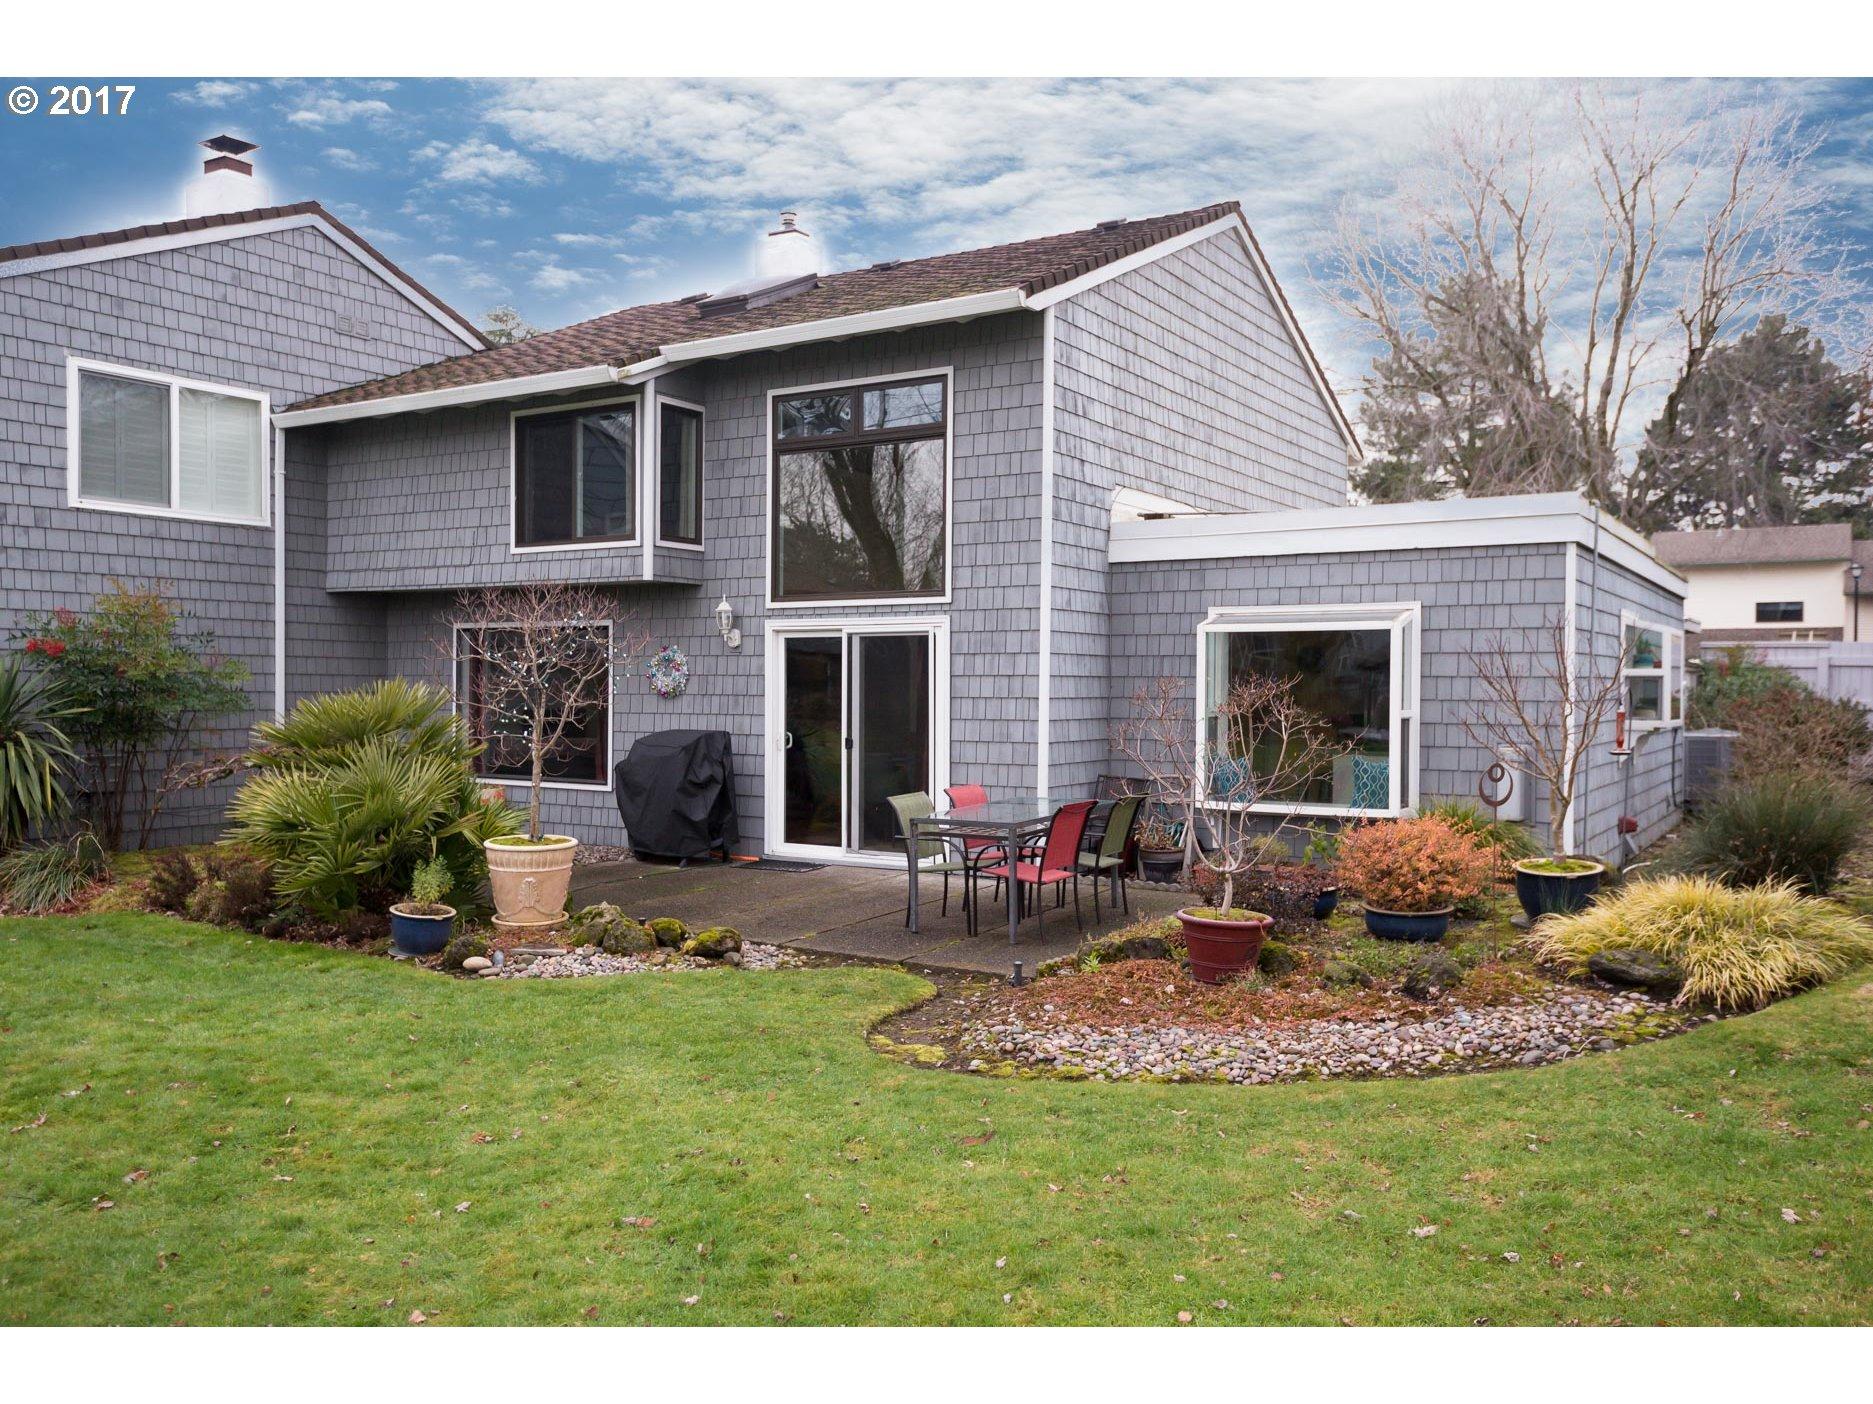 638 N HAYDEN BAY DR, Portland OR 97217